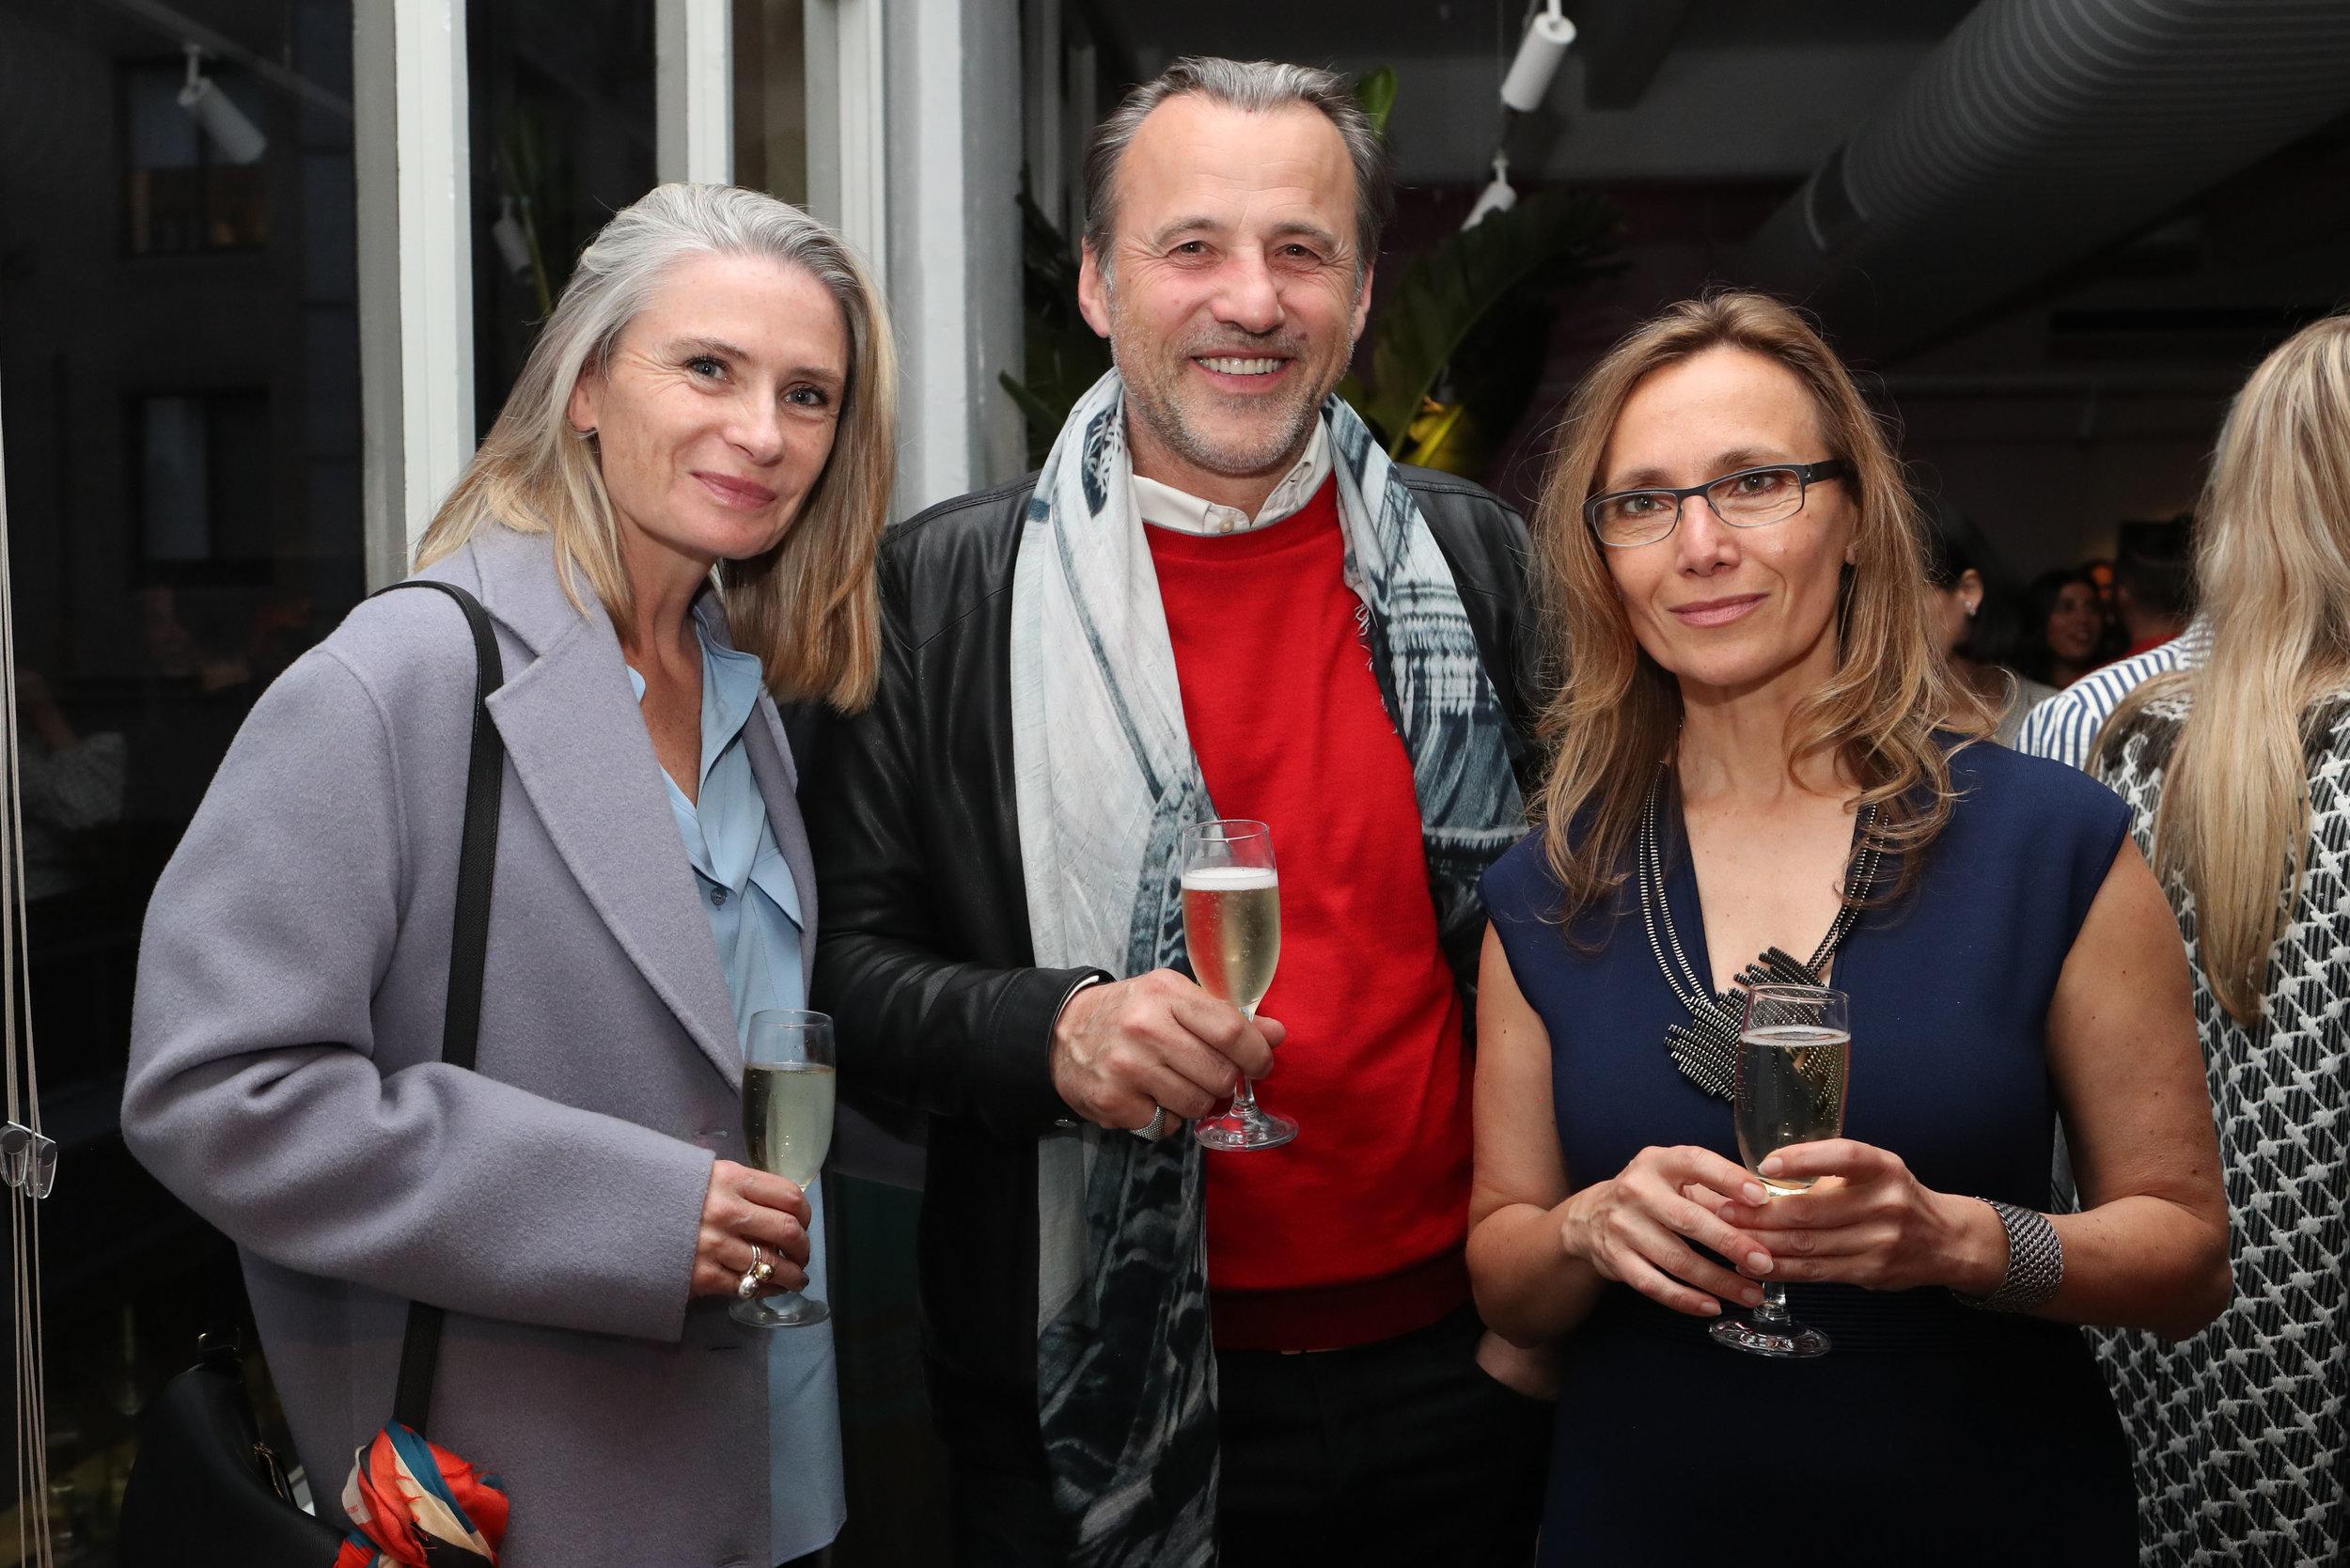 Maryane Shearer, Ned Radojcic and Ljiljana Gazevic (2).jpg